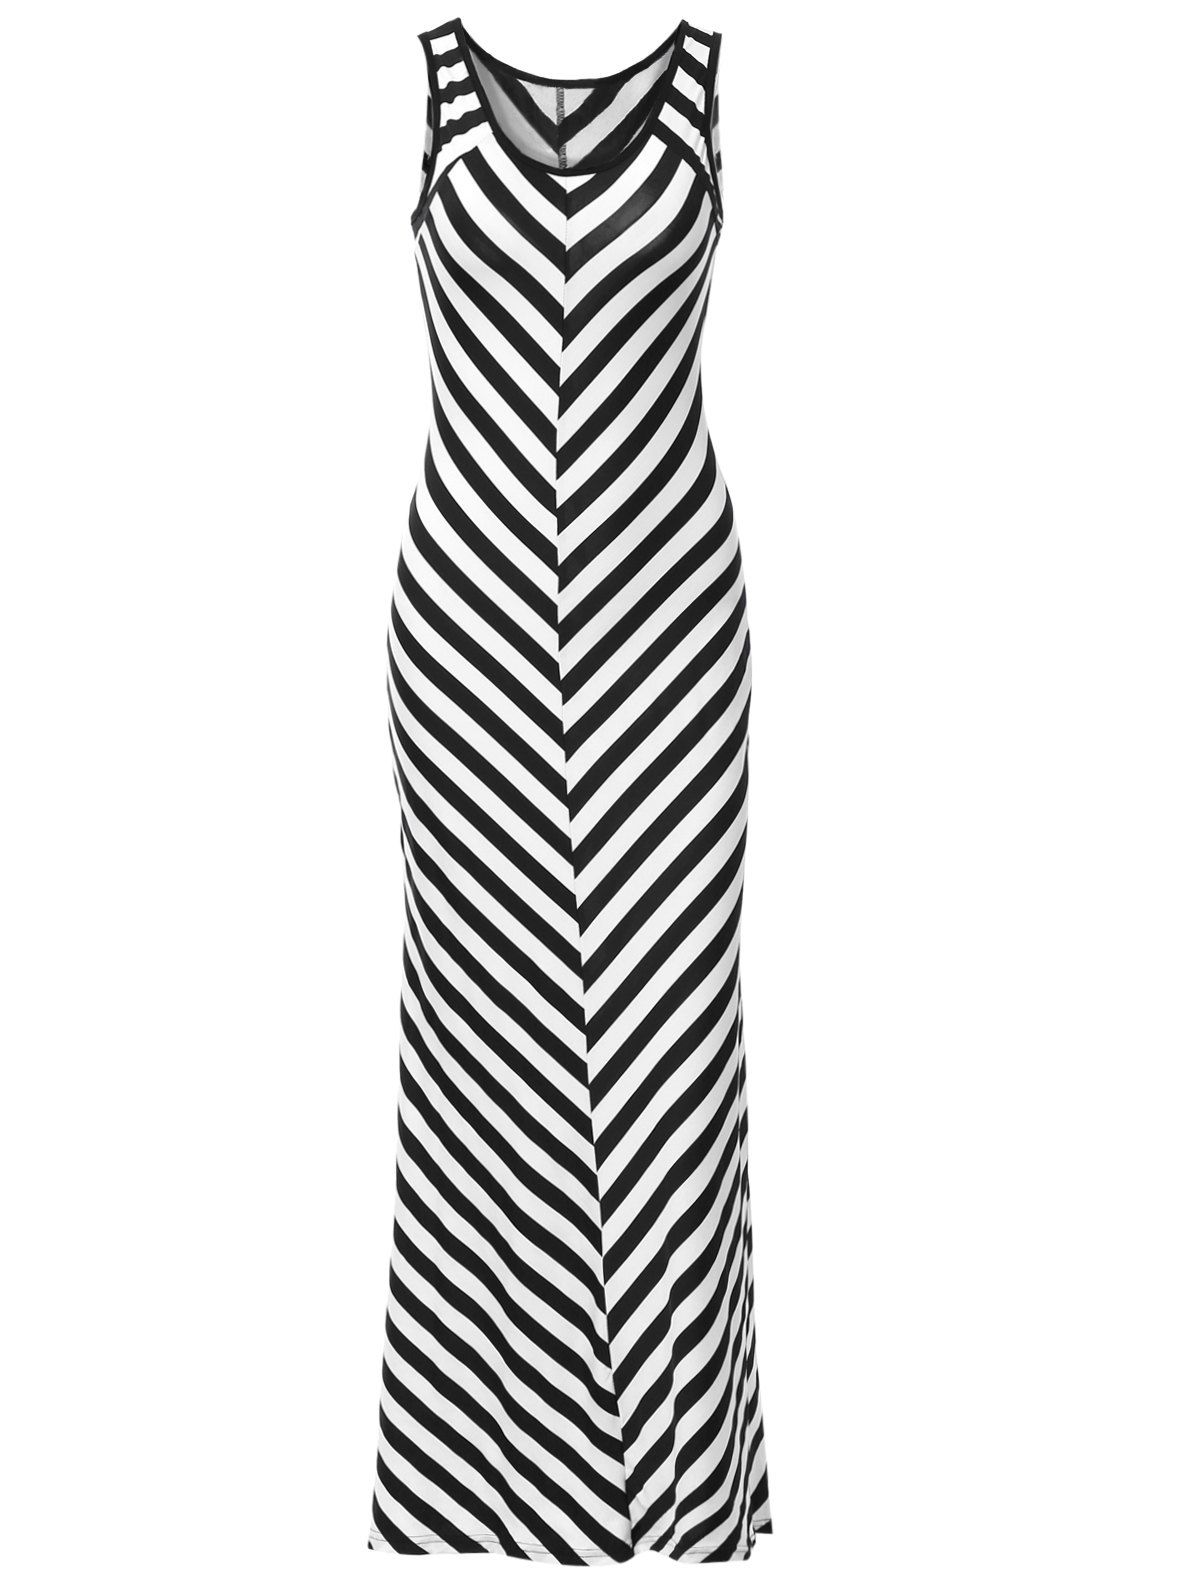 Trendy Scoop Neck Sleeveless Striped Skinny Dress For Women from 21.48$ by SAMMYDRESS